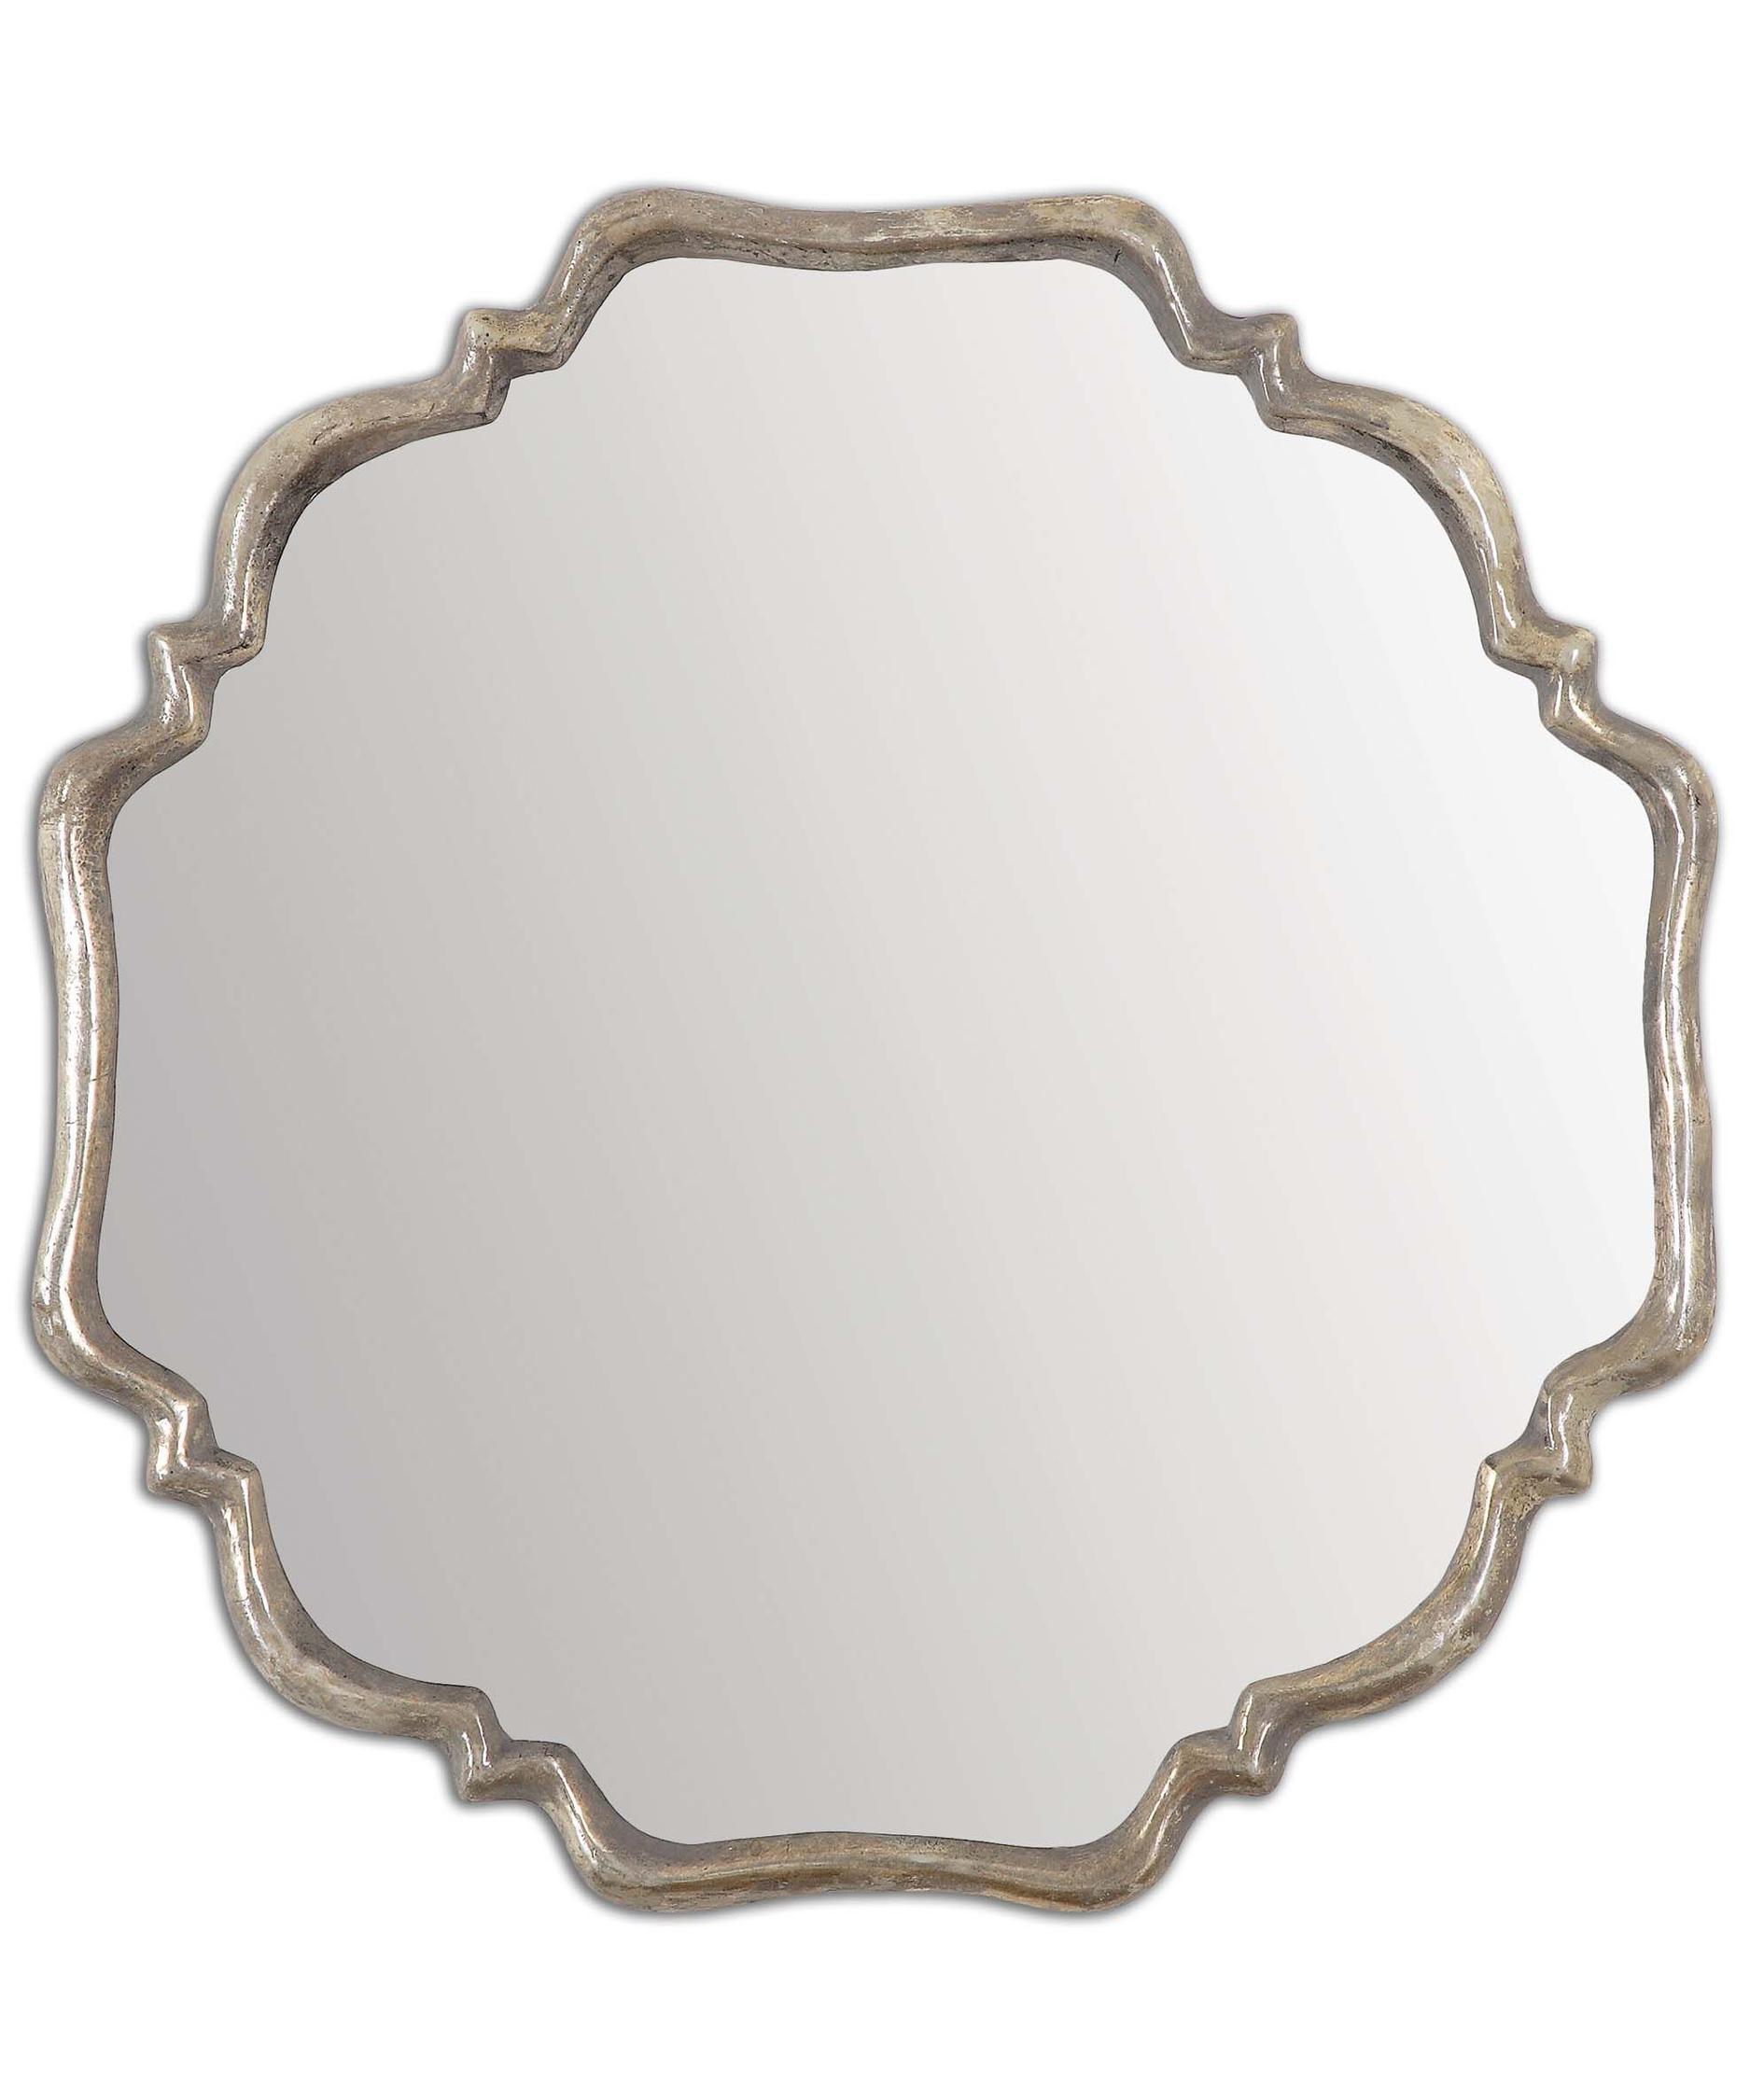 Uttermost Wall Mirrors Decorative